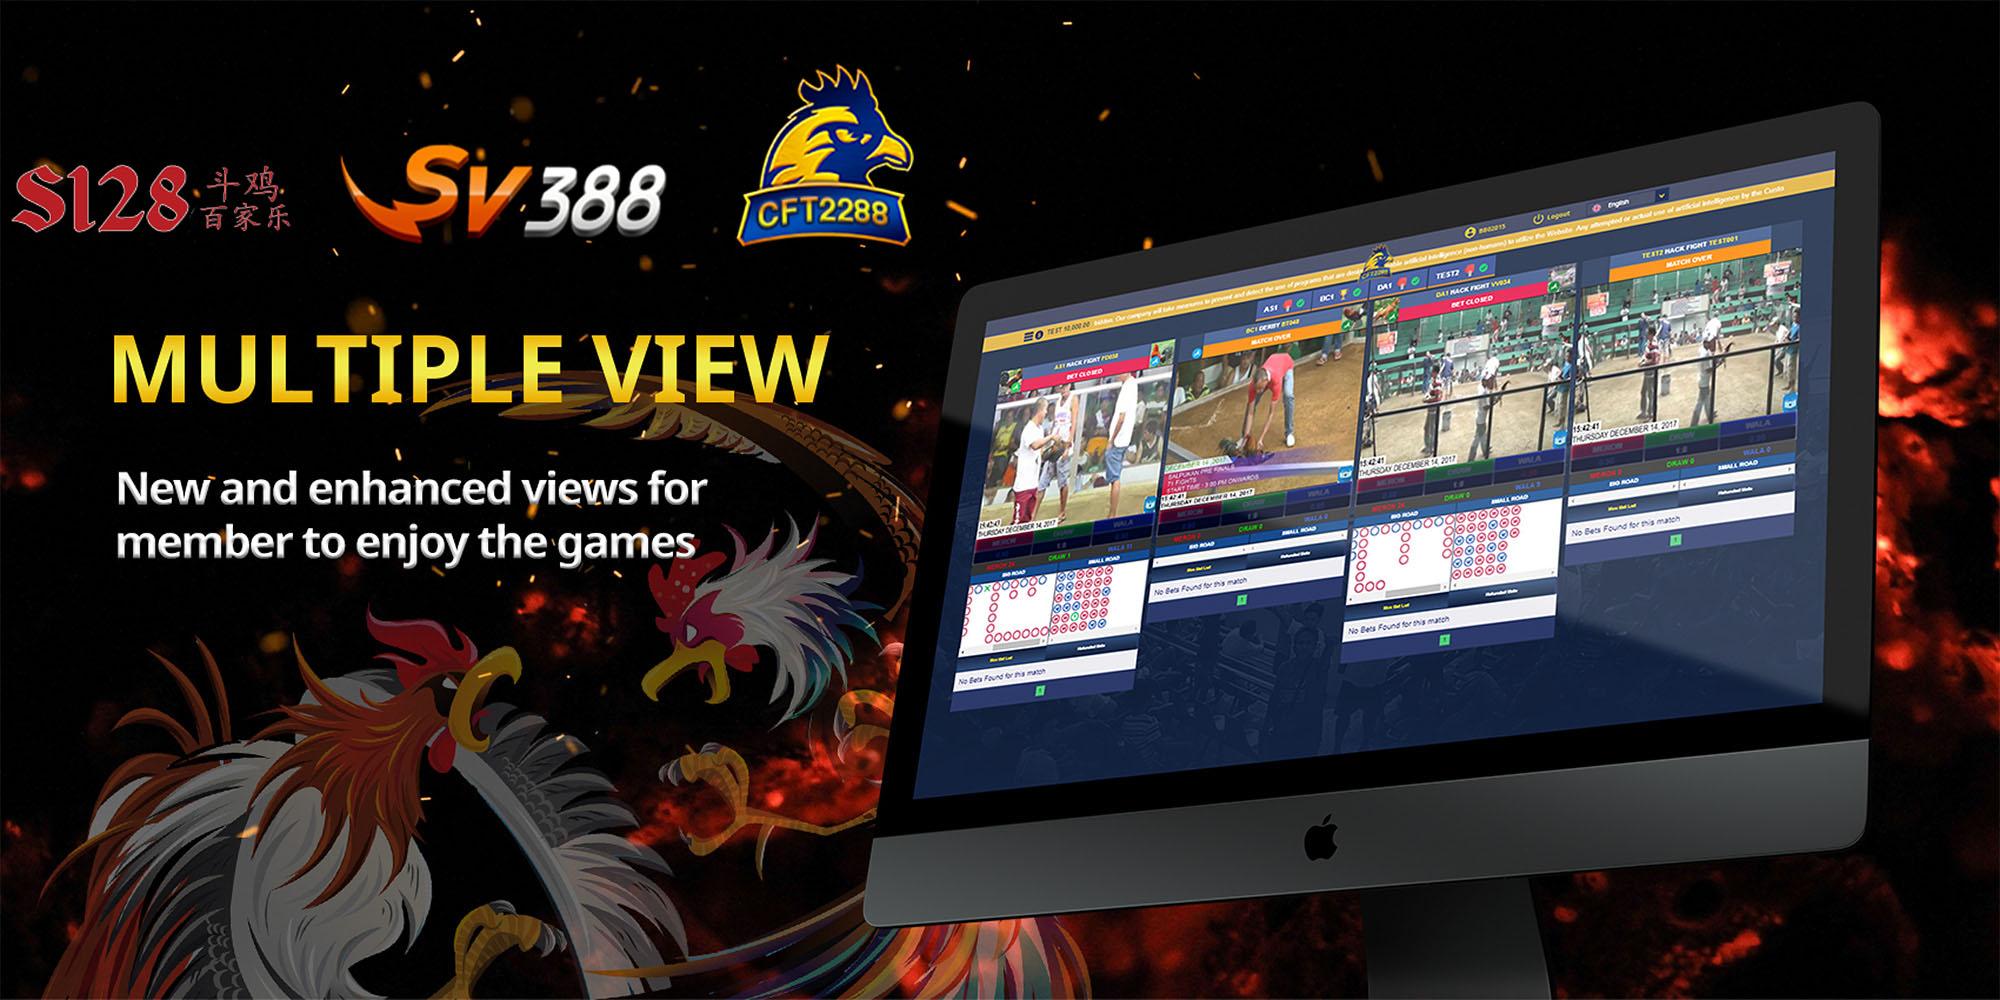 Situs Agen Judi Sabung Ayam Online s128, sv388, cft2288